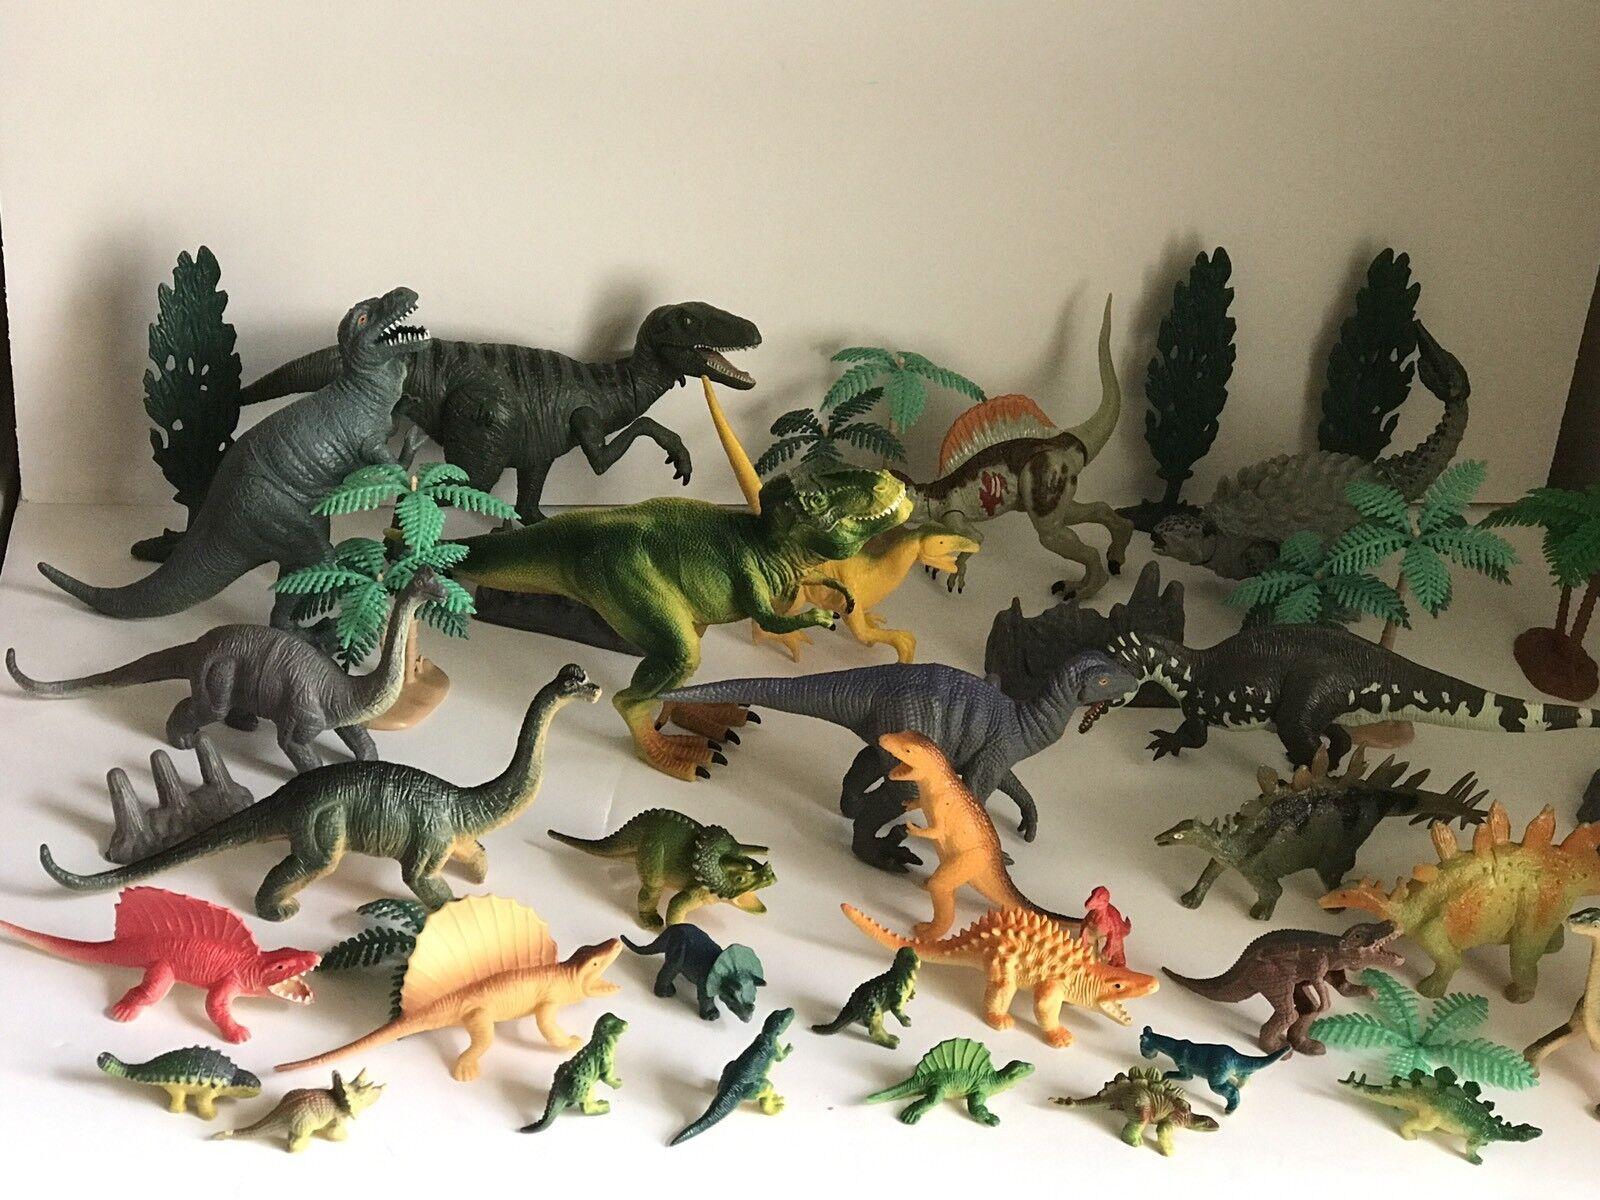 29 Dinosaurs Plastic Play Figures Collection T Rex Velociraptor Jurassic Park